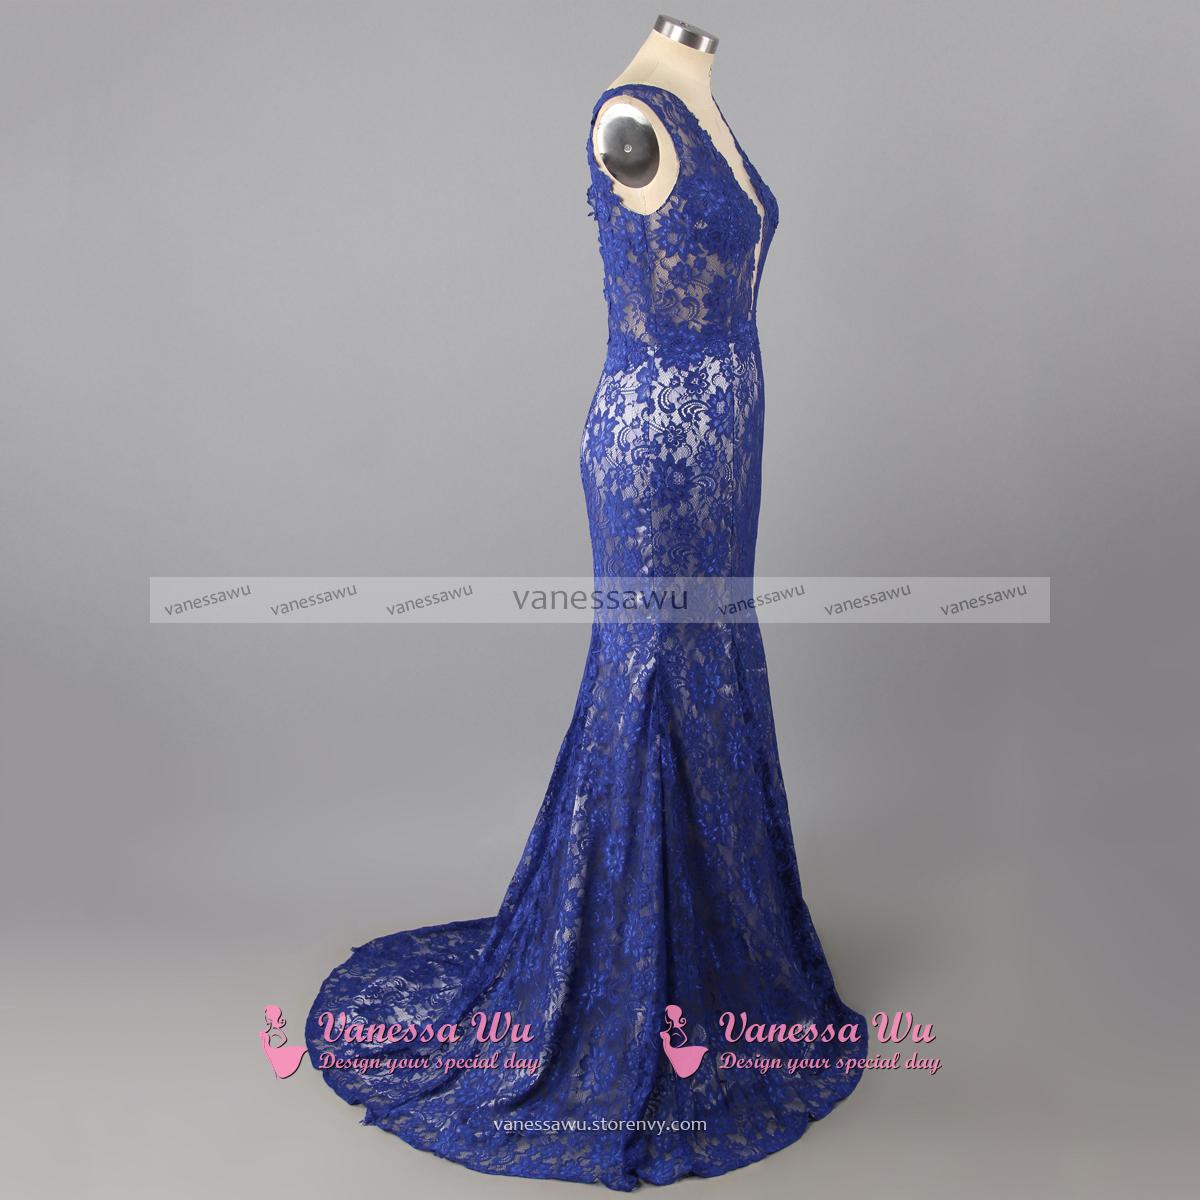 15f8cee4d3 2 Piece Blue Floral Prom Dress - Gomes Weine AG